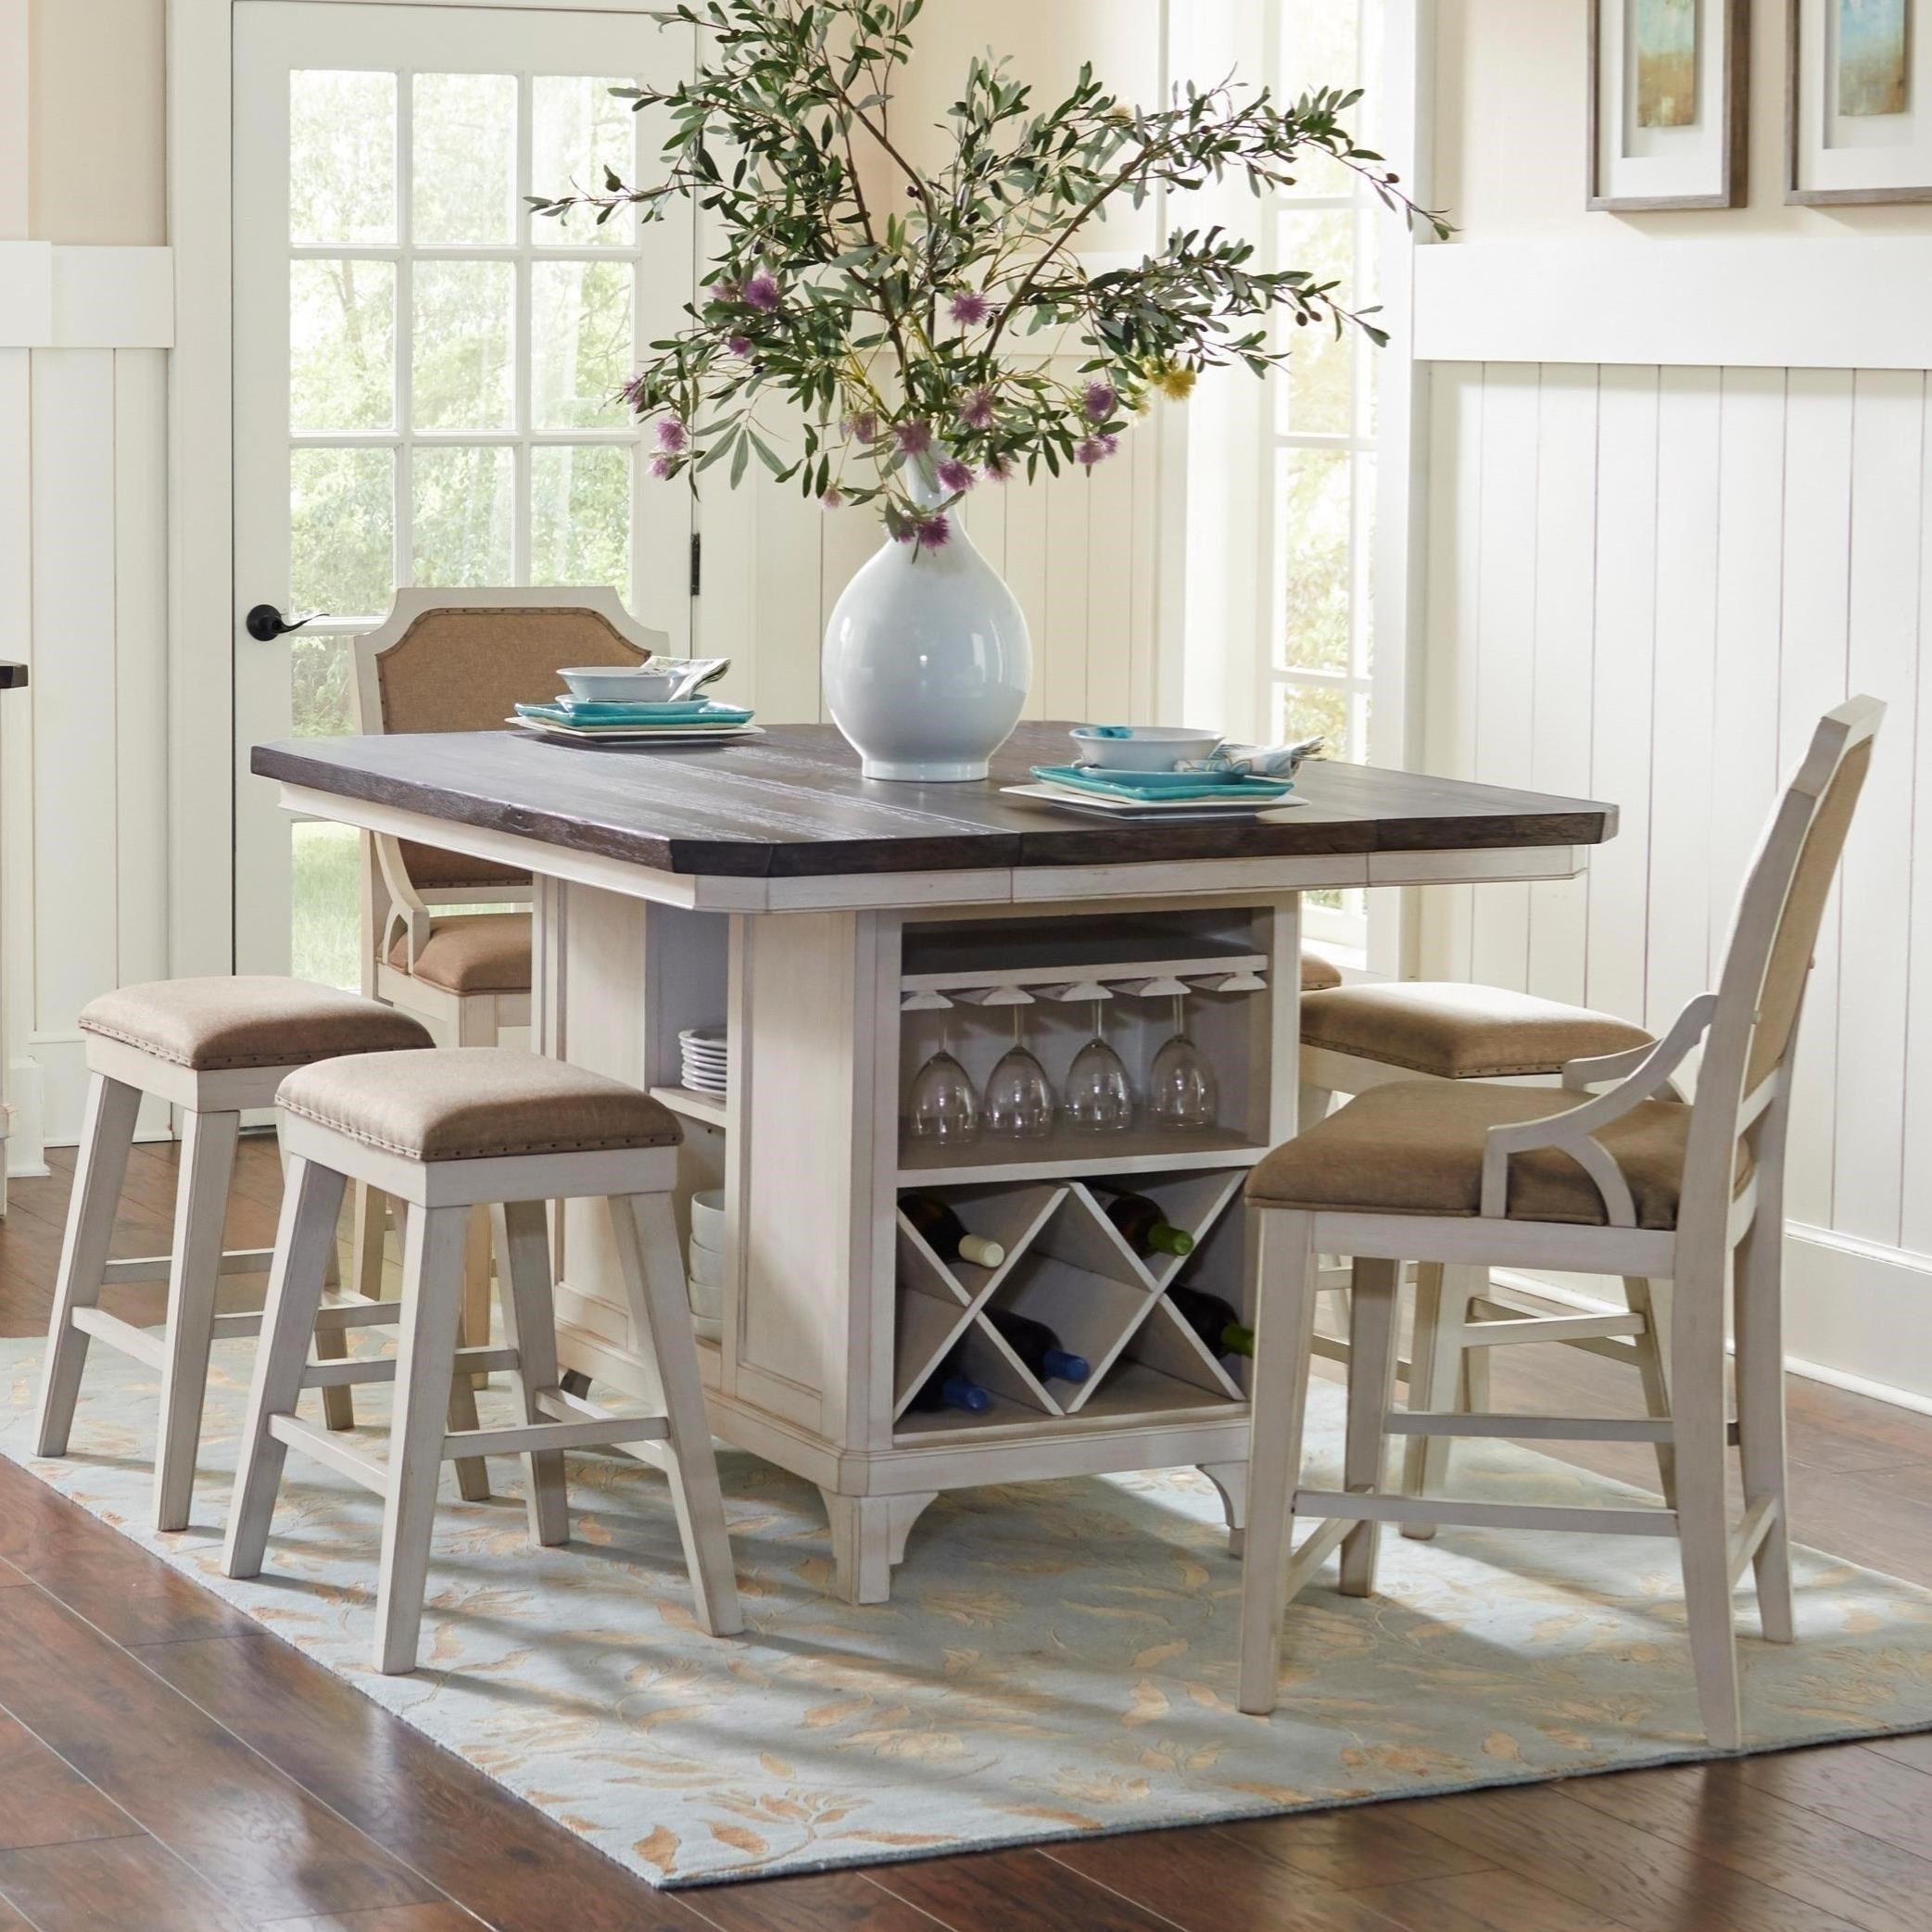 Captivating Avalon Furniture Mystic Cay 7 Piece Kitchen Island Table Set